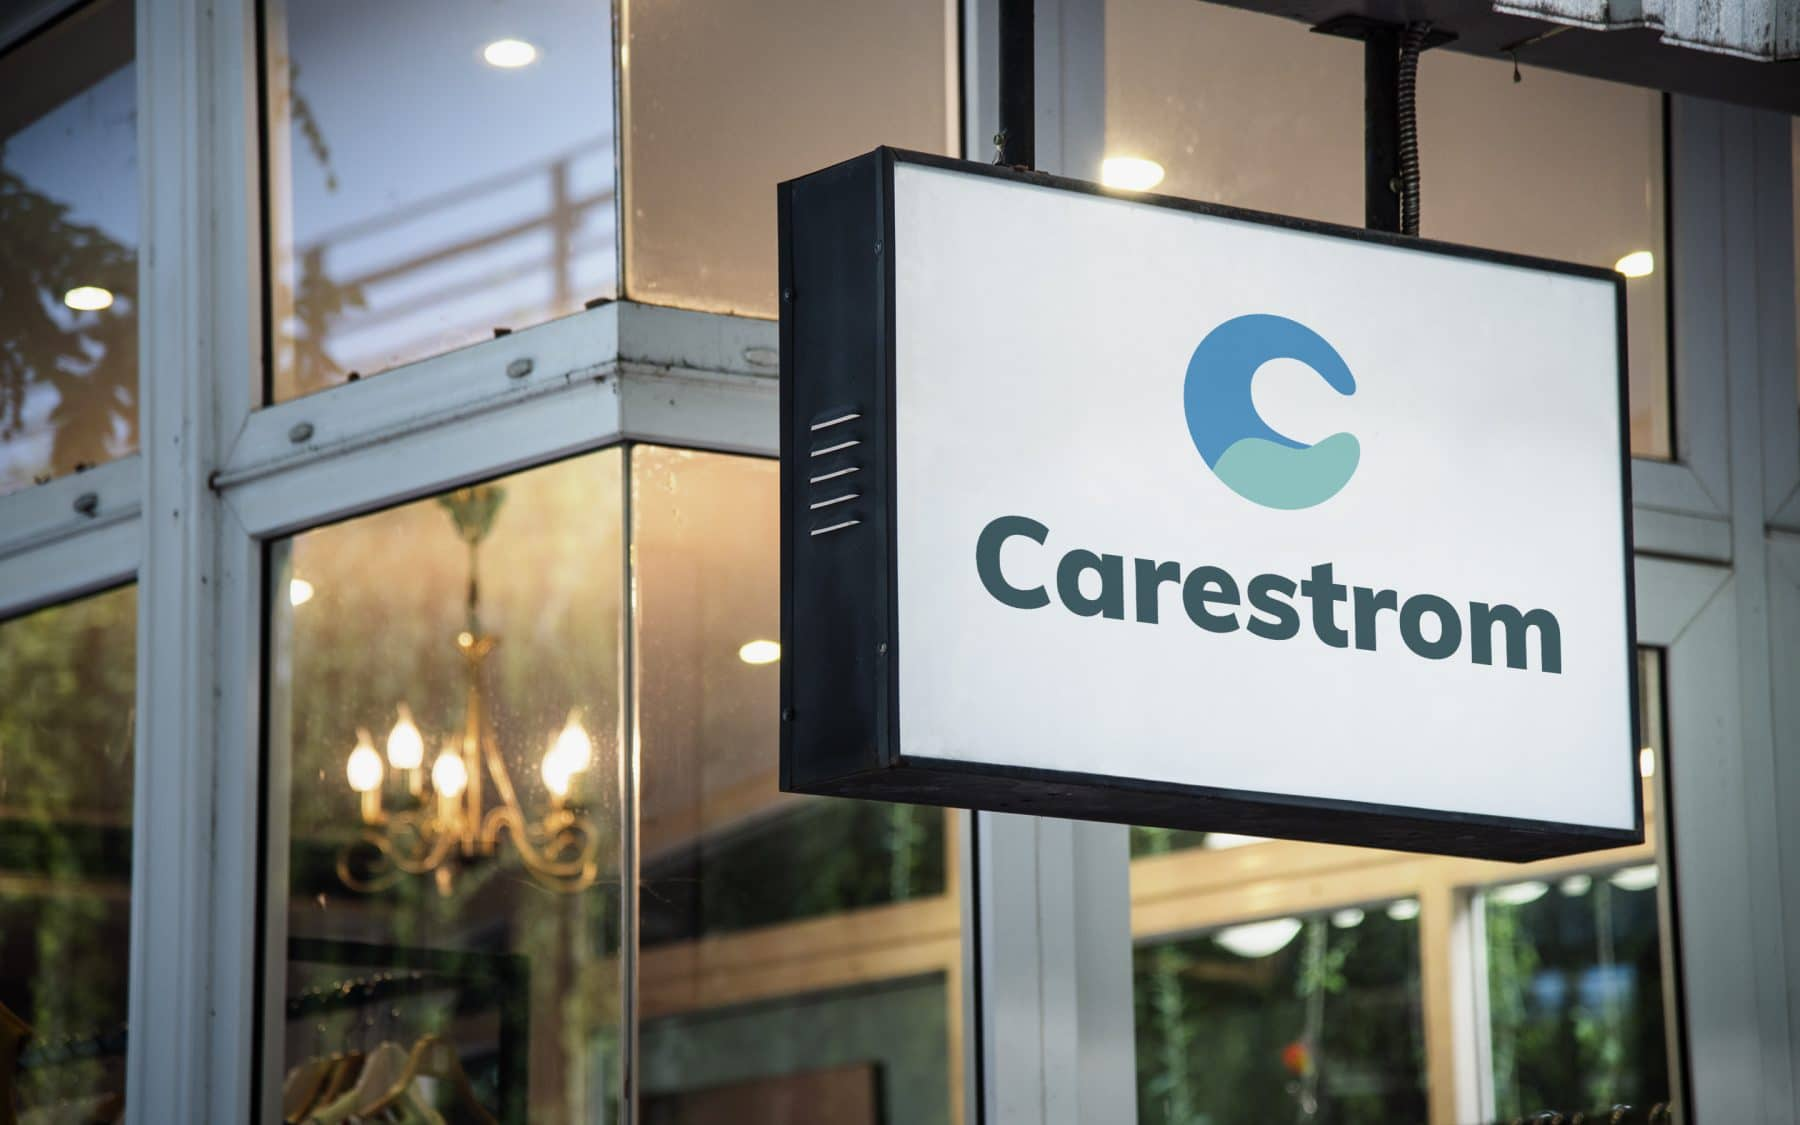 Carestrom